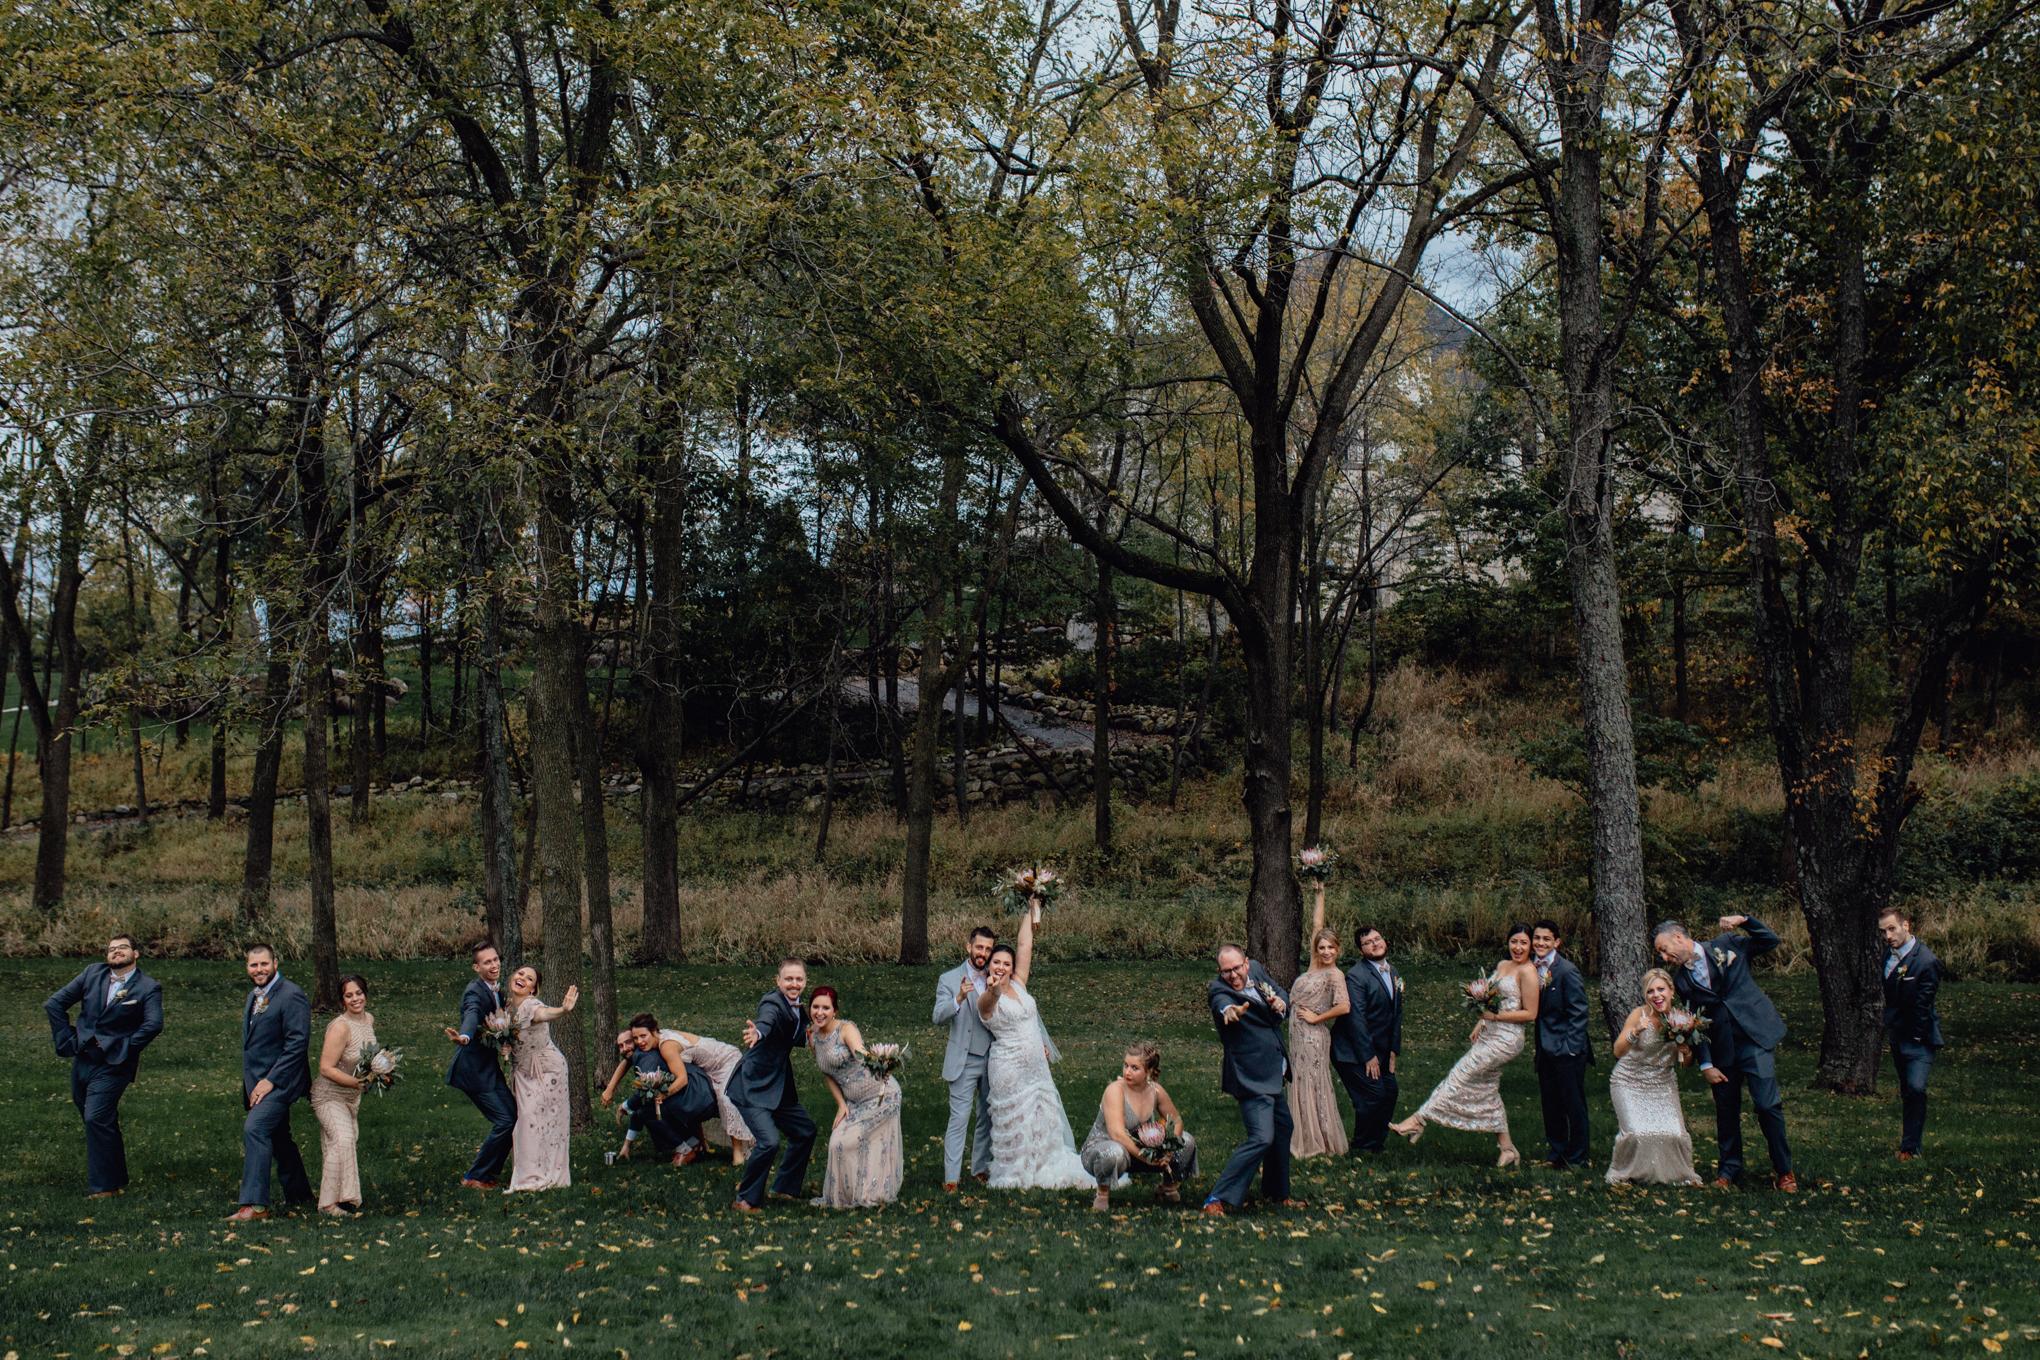 bridesmaids-and-groomsmen-posing-in-grass.jpg